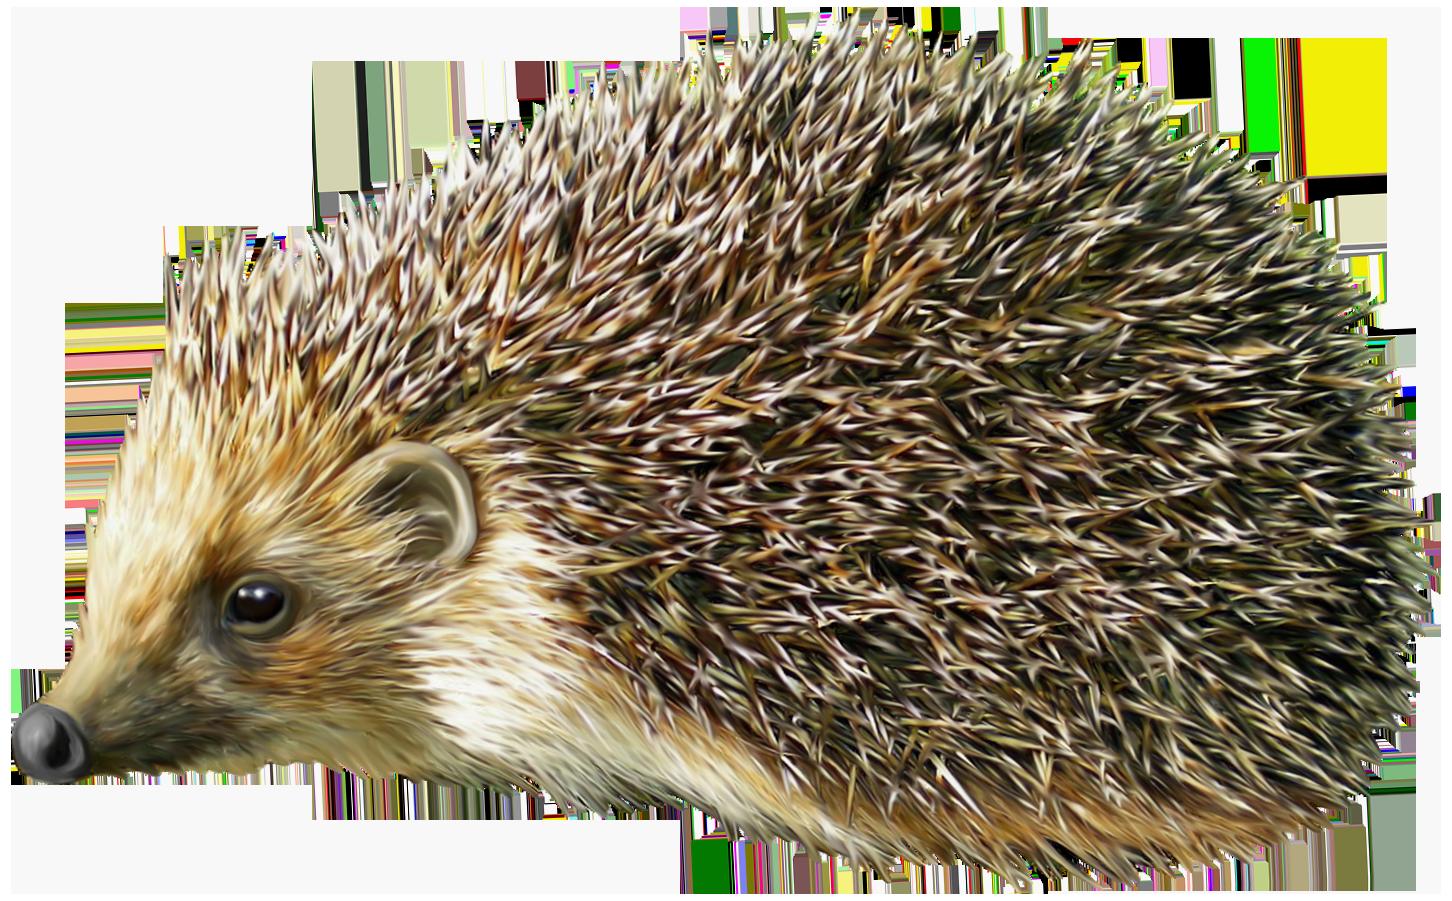 Hedgehog clipart #13, Download drawings